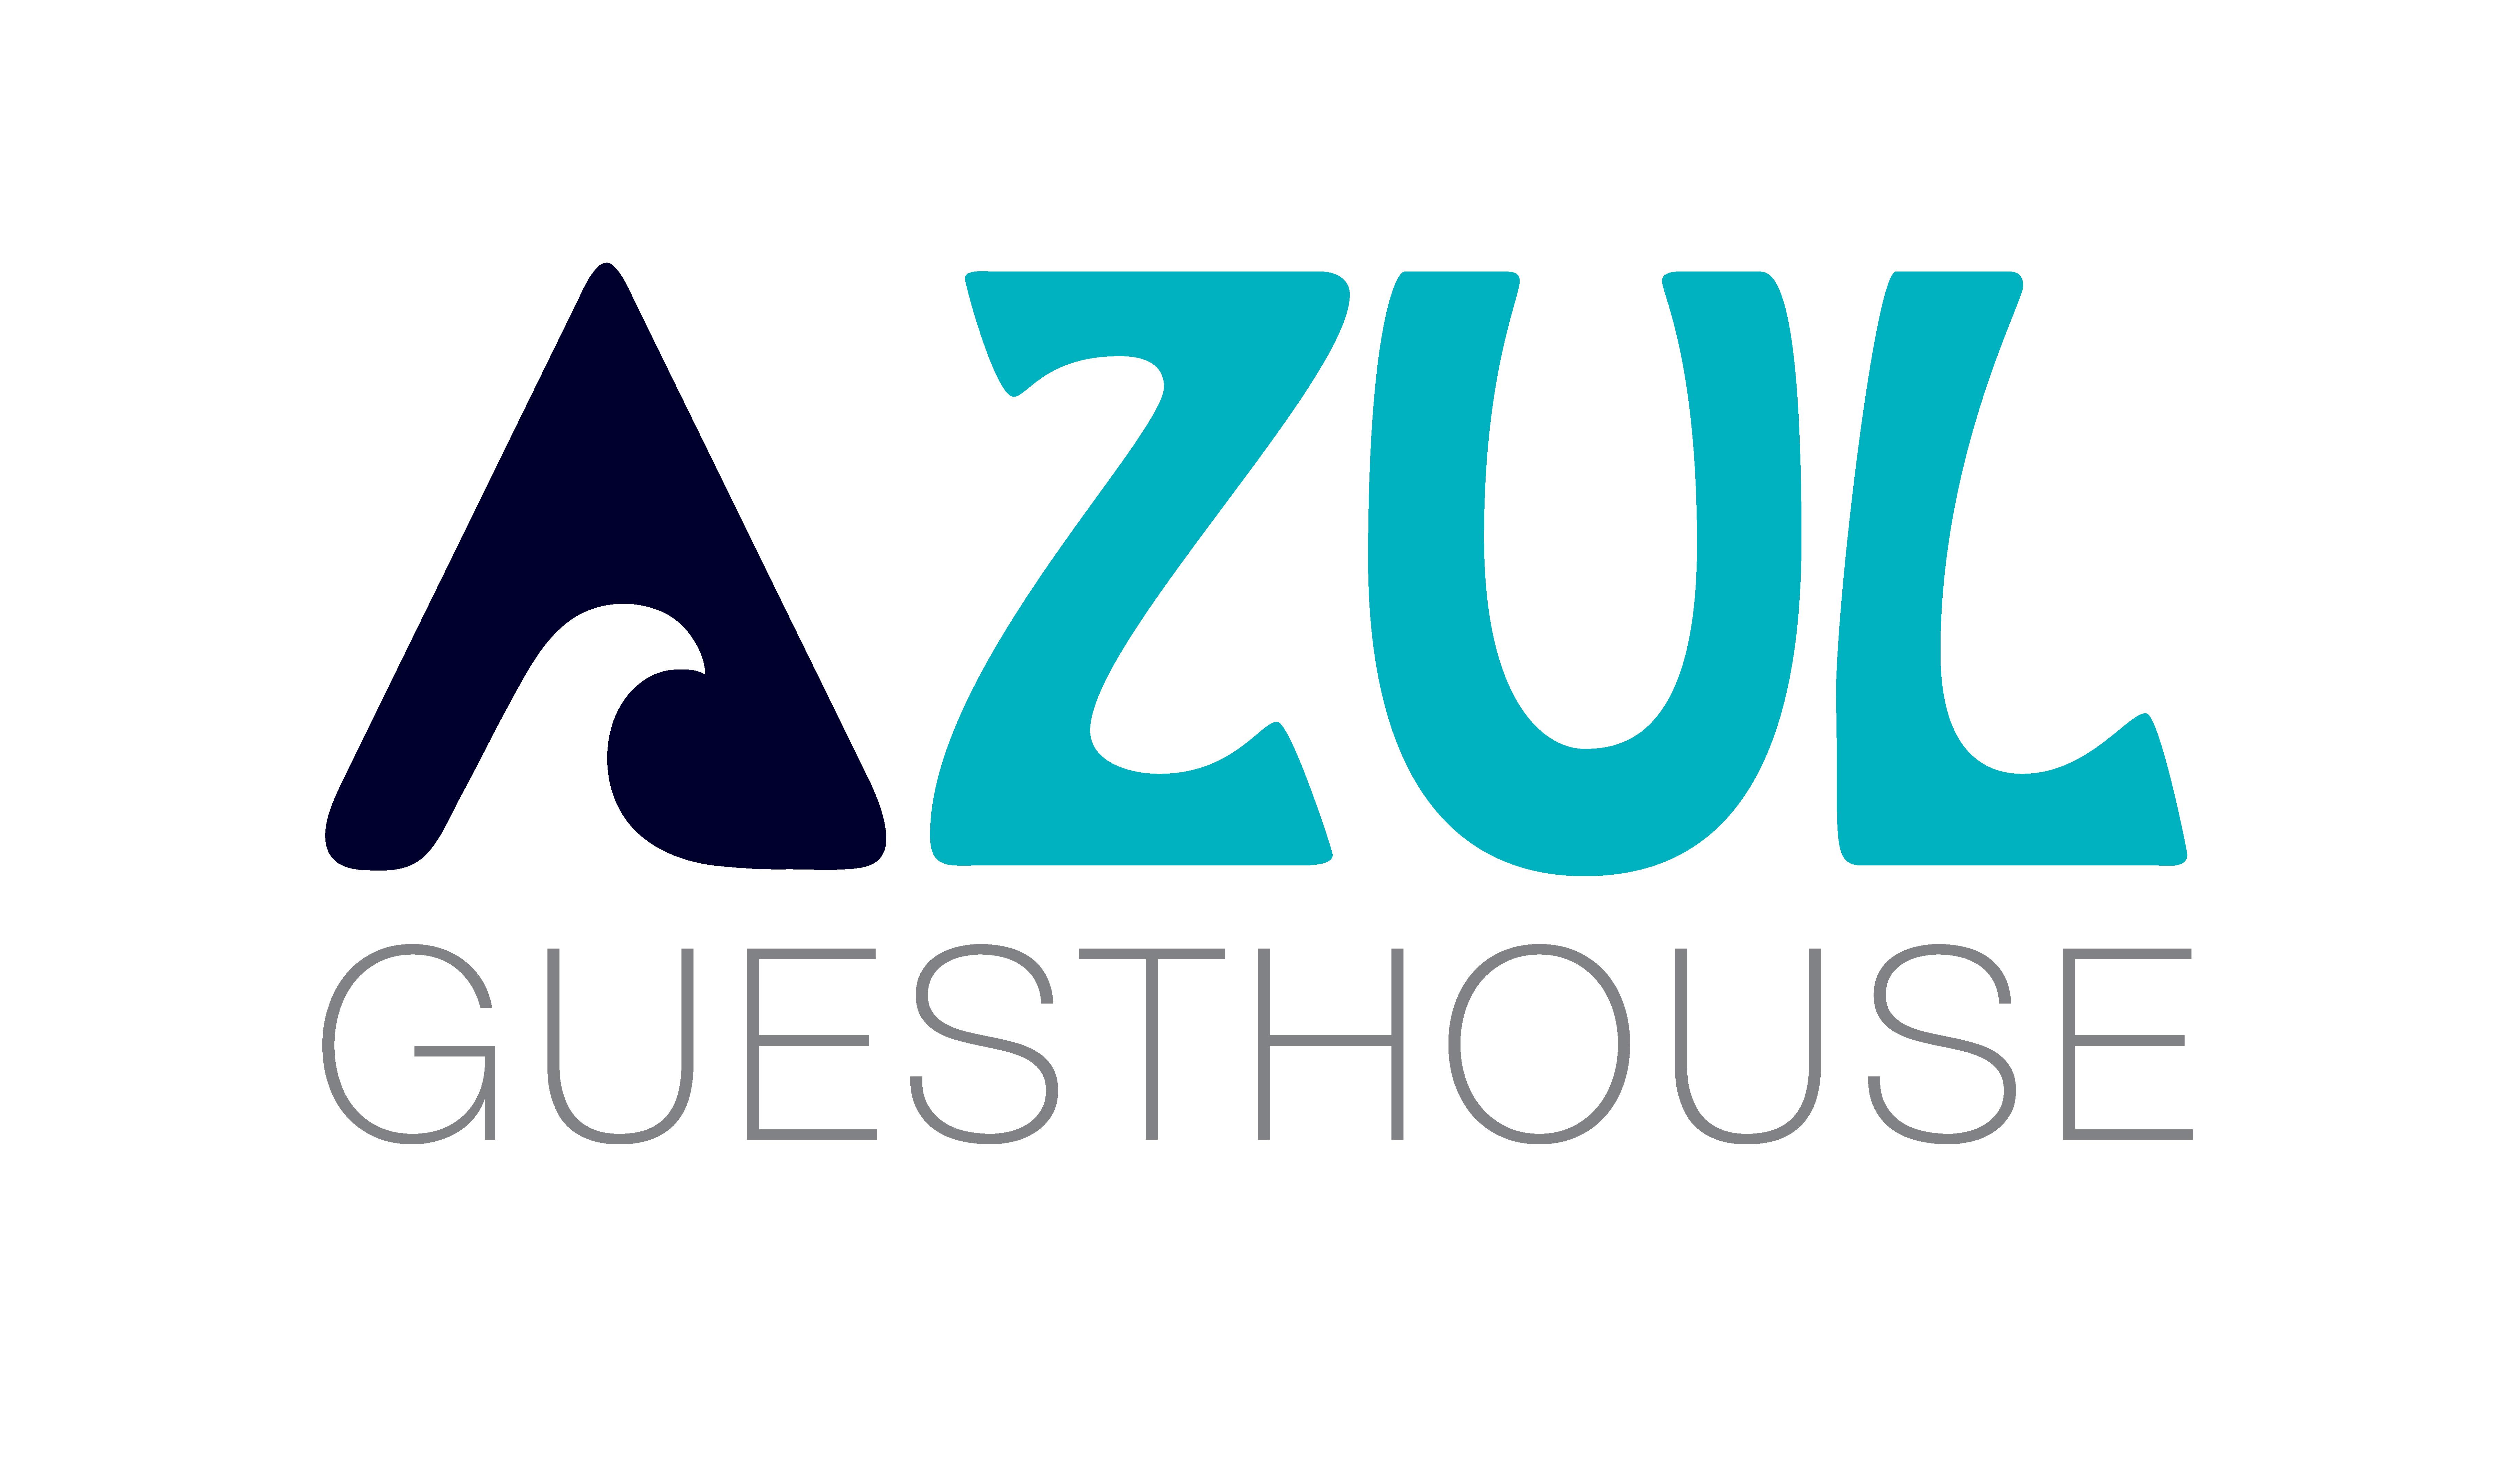 Azul Guesthouse